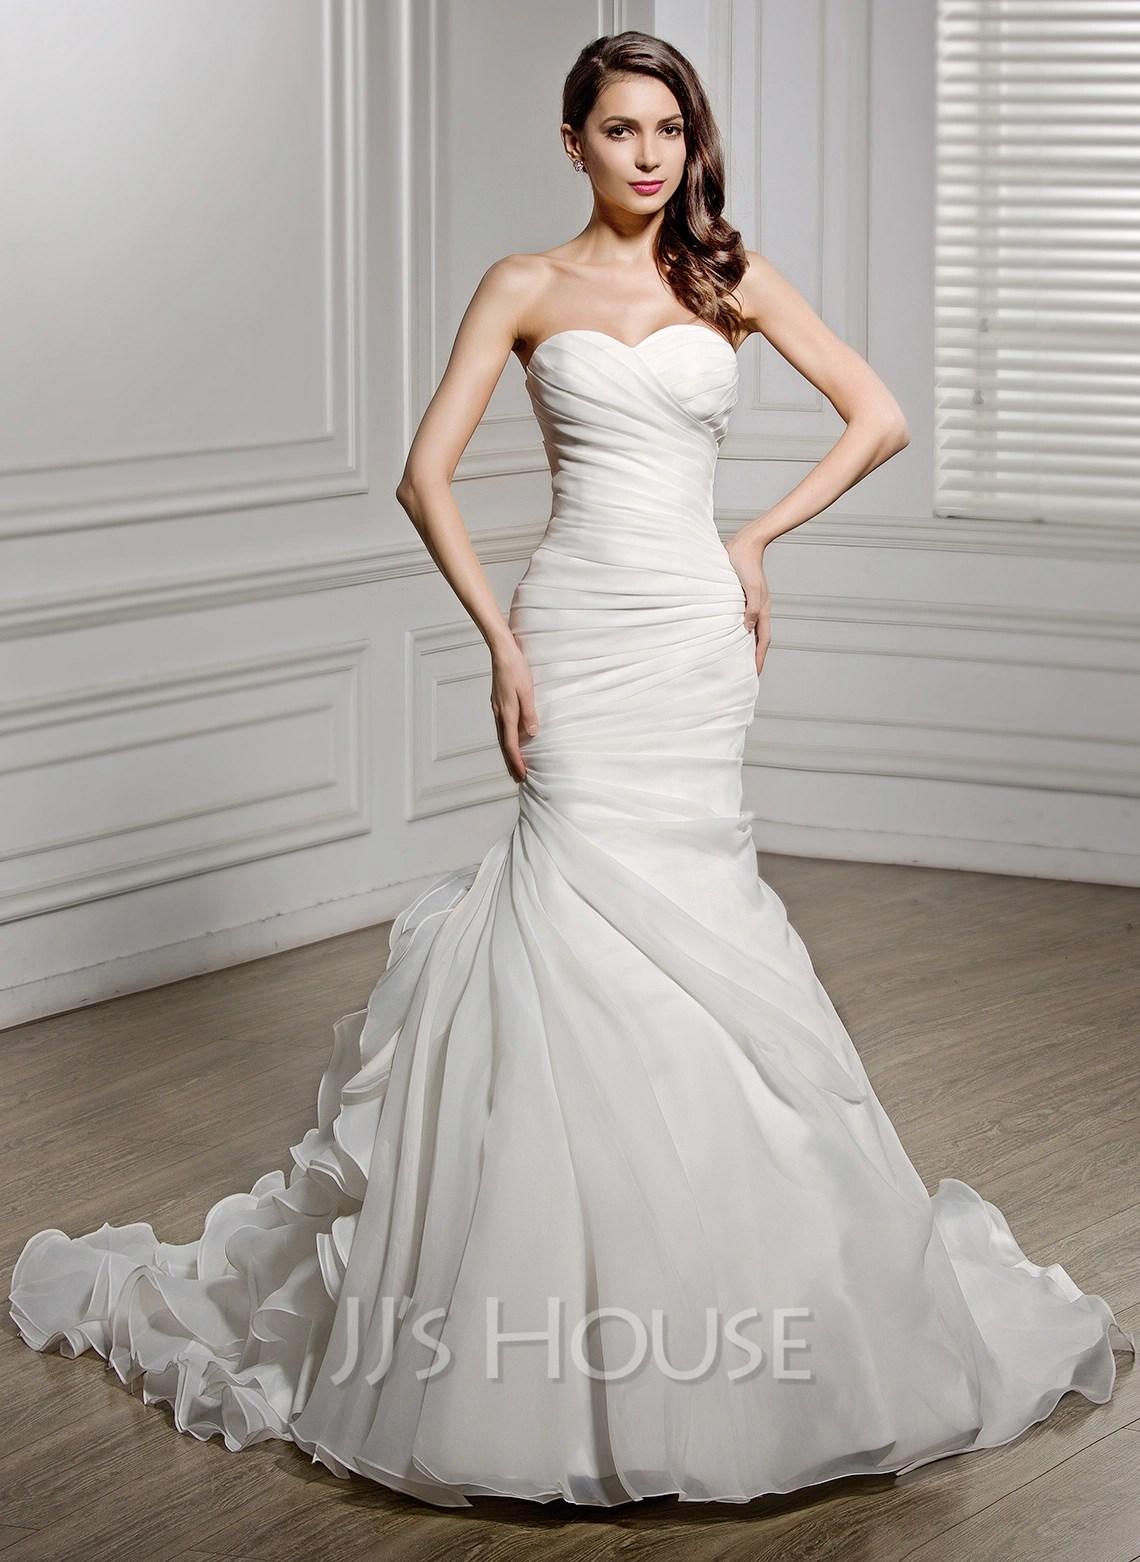 Trumpet Mermaid Sweetheart Chapel Train Organza Wedding Dress With Ruffle g jjshouse wedding dress Home Wedding Dresses Loading zoom